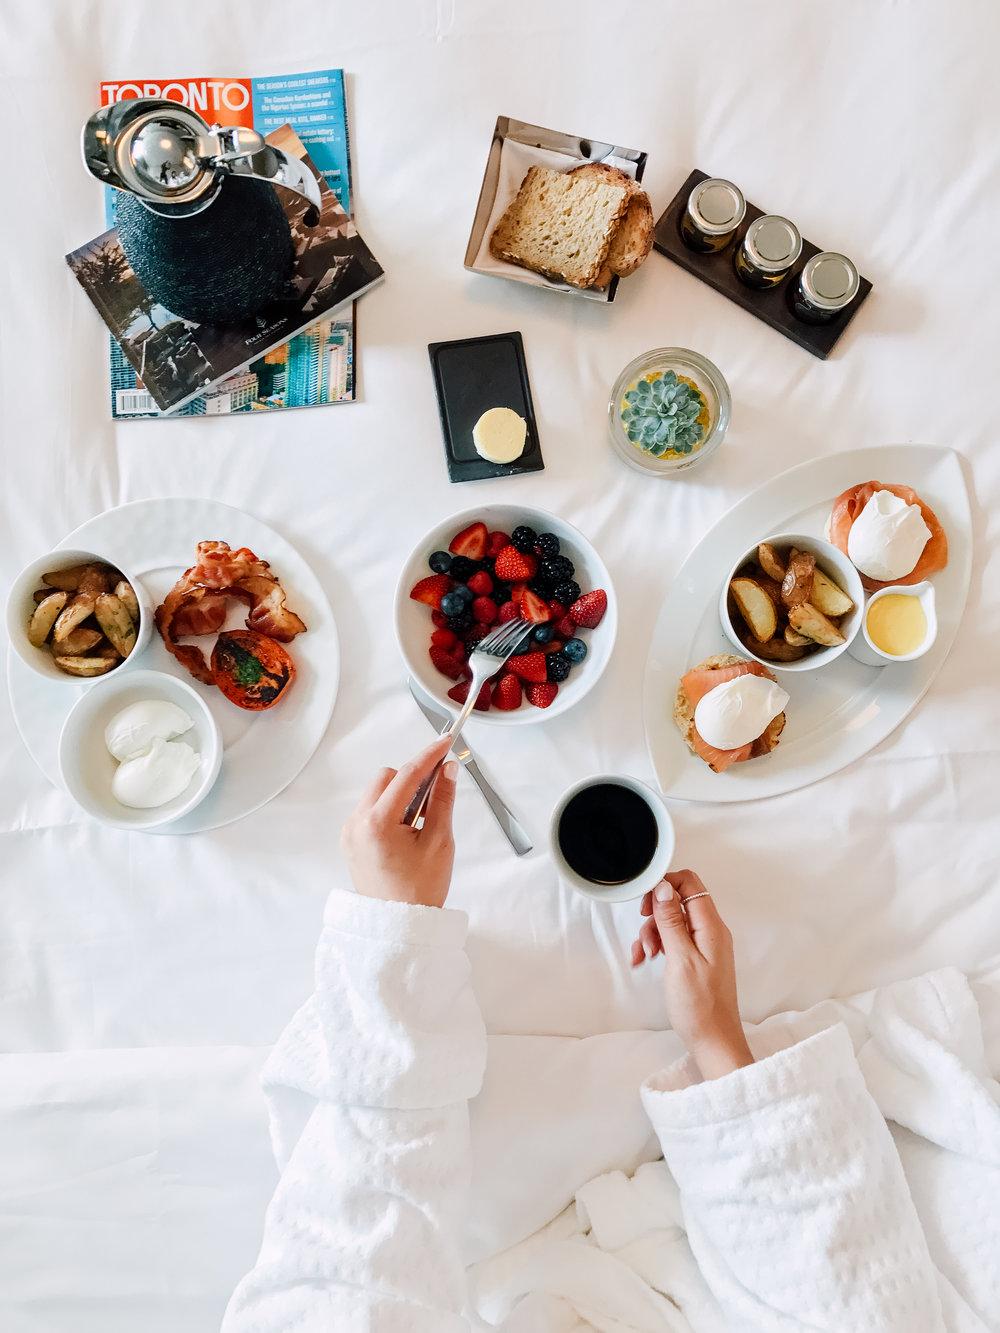 Hotel breakfast shot for instagram by a social media photographer